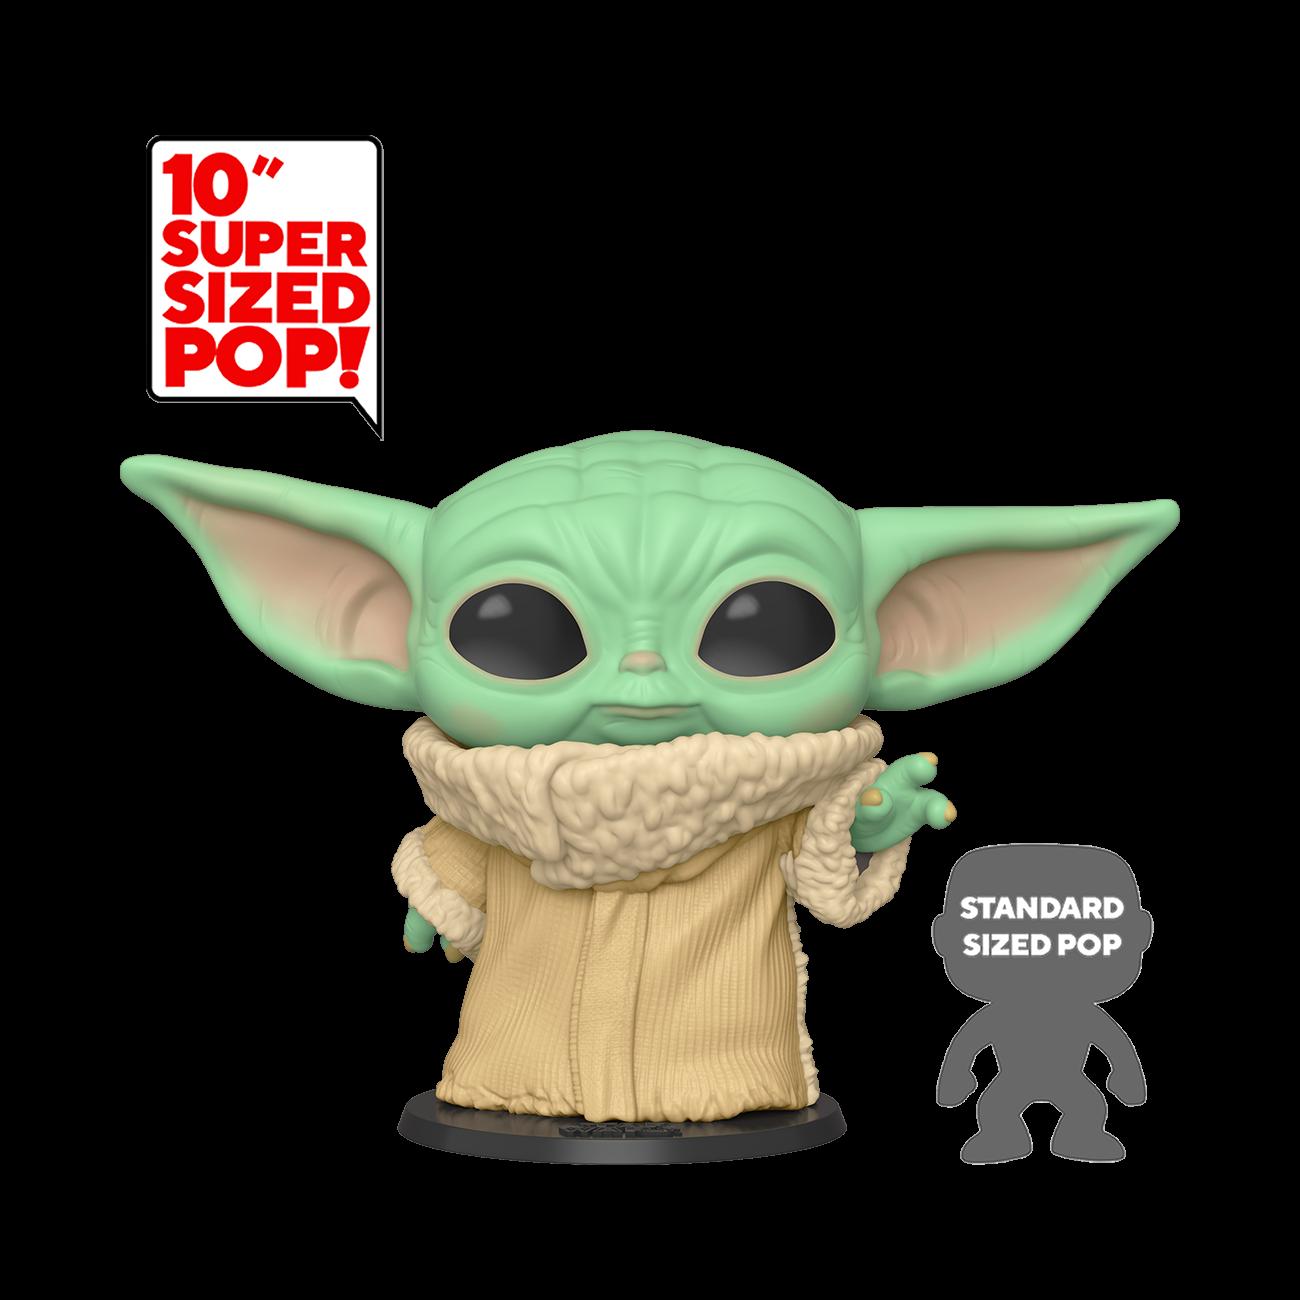 Funko POP! - Big Figure - The Child 25 cm (Baby Yoda) (Star Wars: The Mandalorian) (49757)